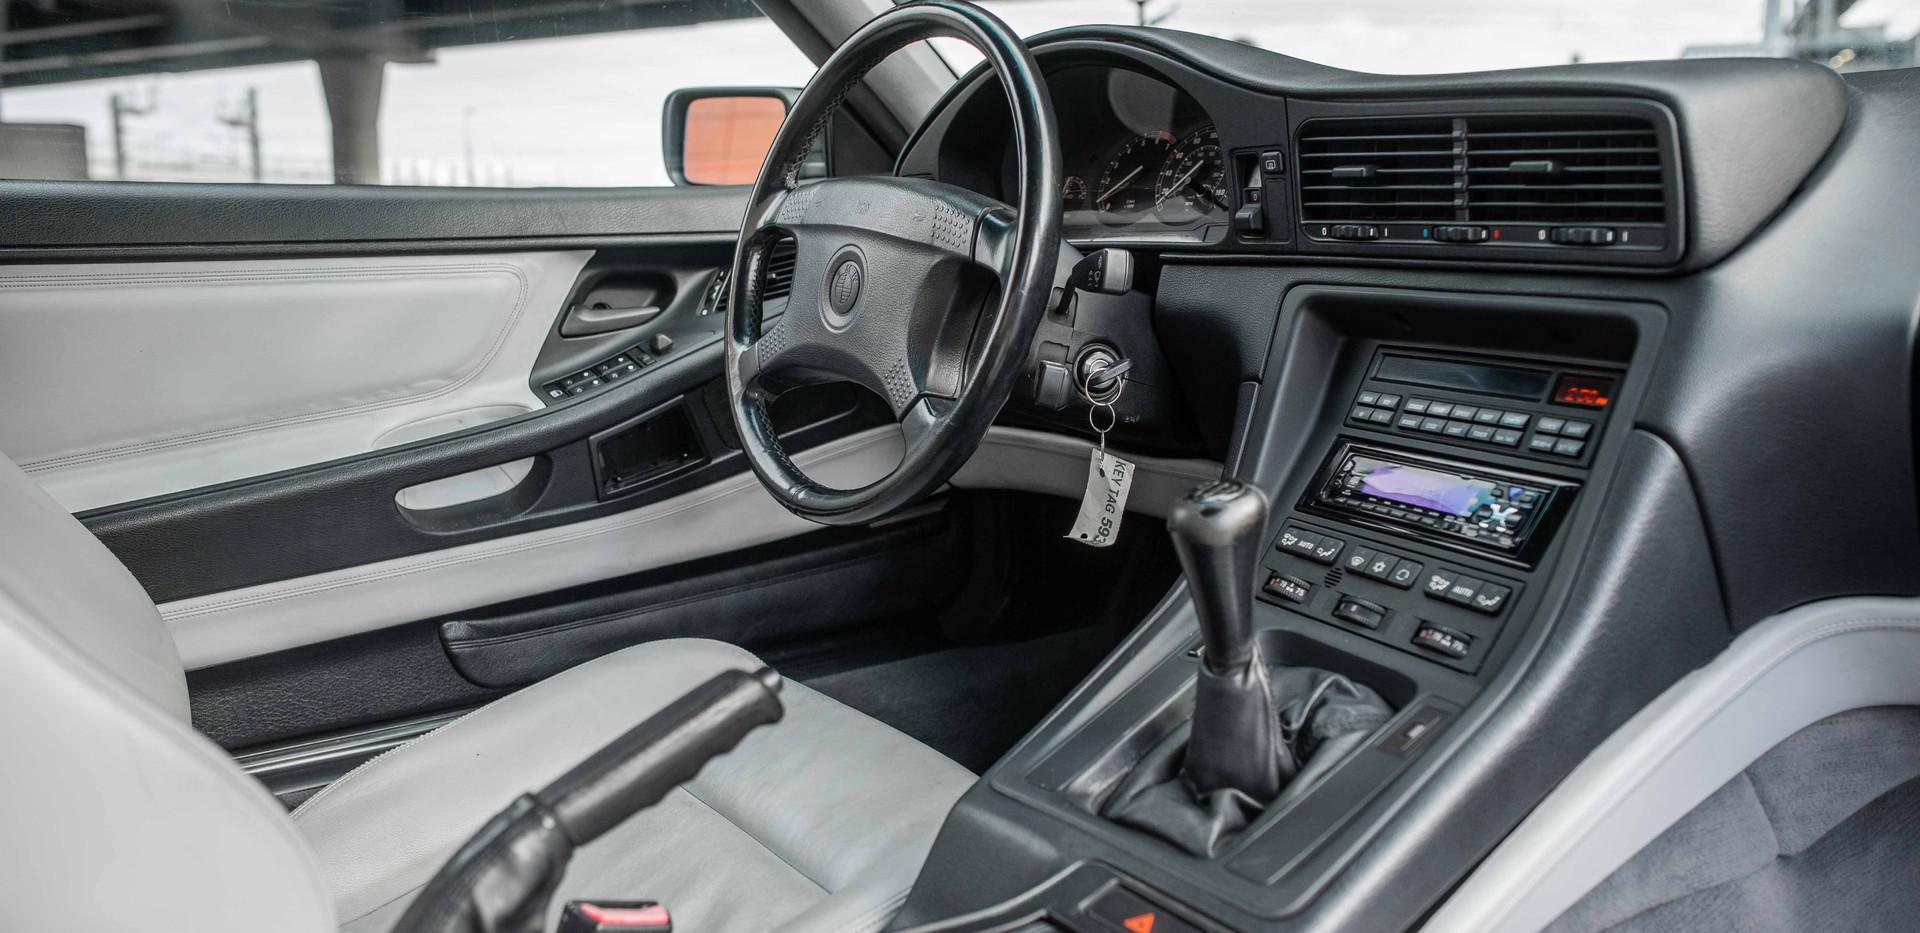 Interior_Passenger_2_850.jpg